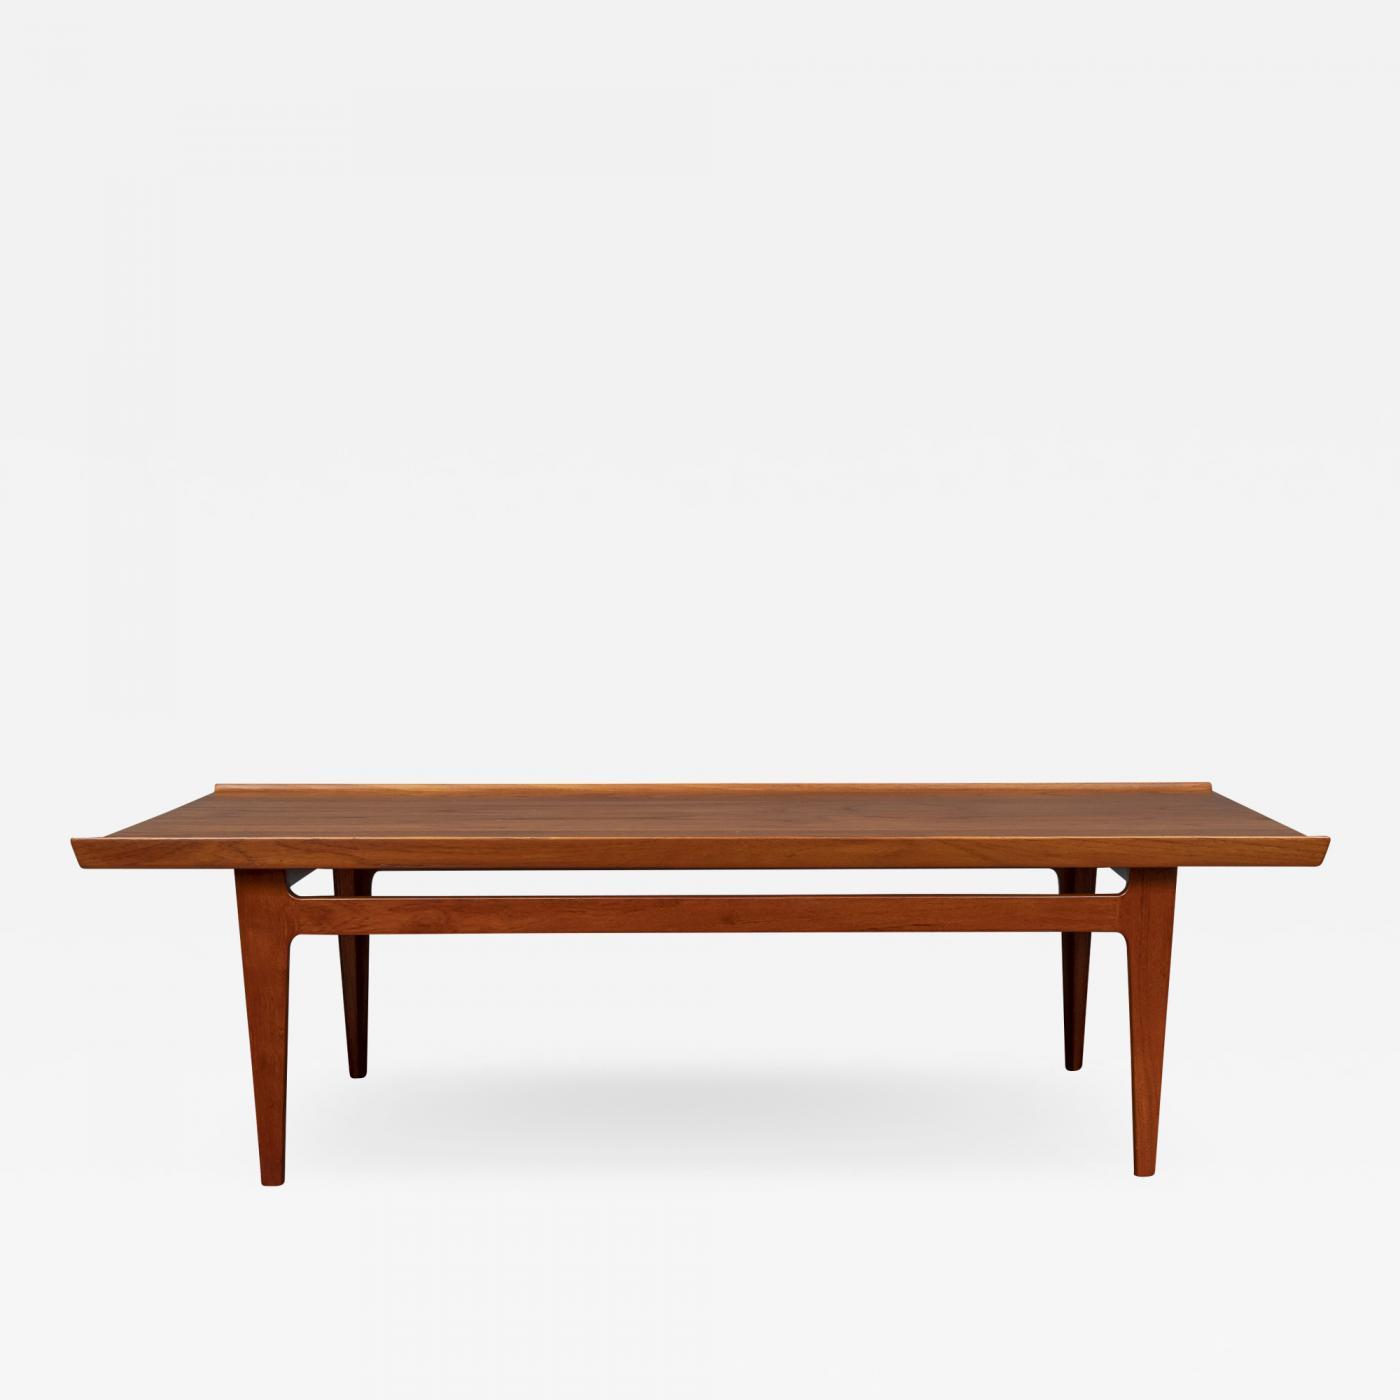 Peachy Finn Juhl Finn Juhl Coffee Table Fd 32 For France Son Pabps2019 Chair Design Images Pabps2019Com